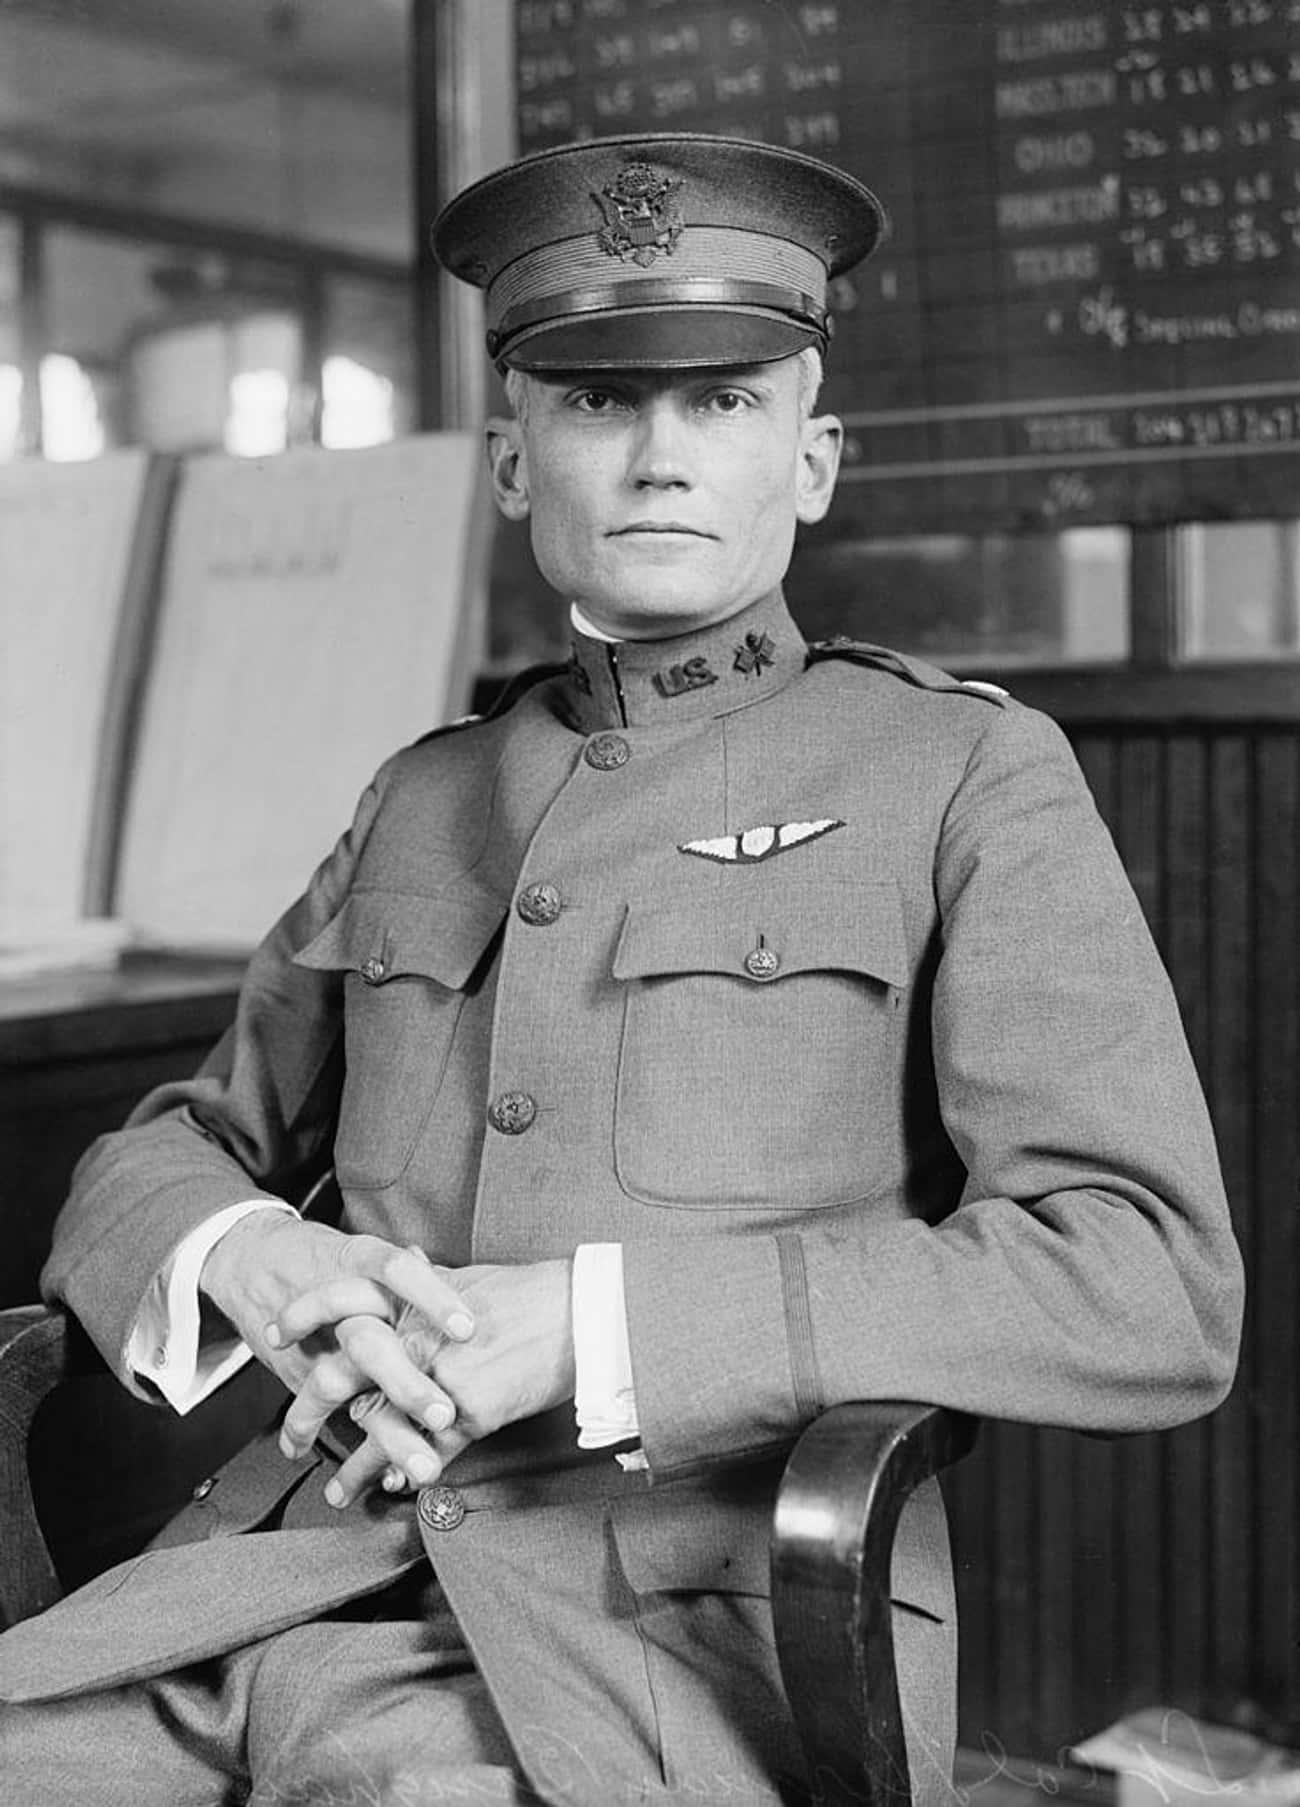 Hiram Bingham III: Indiana Jones